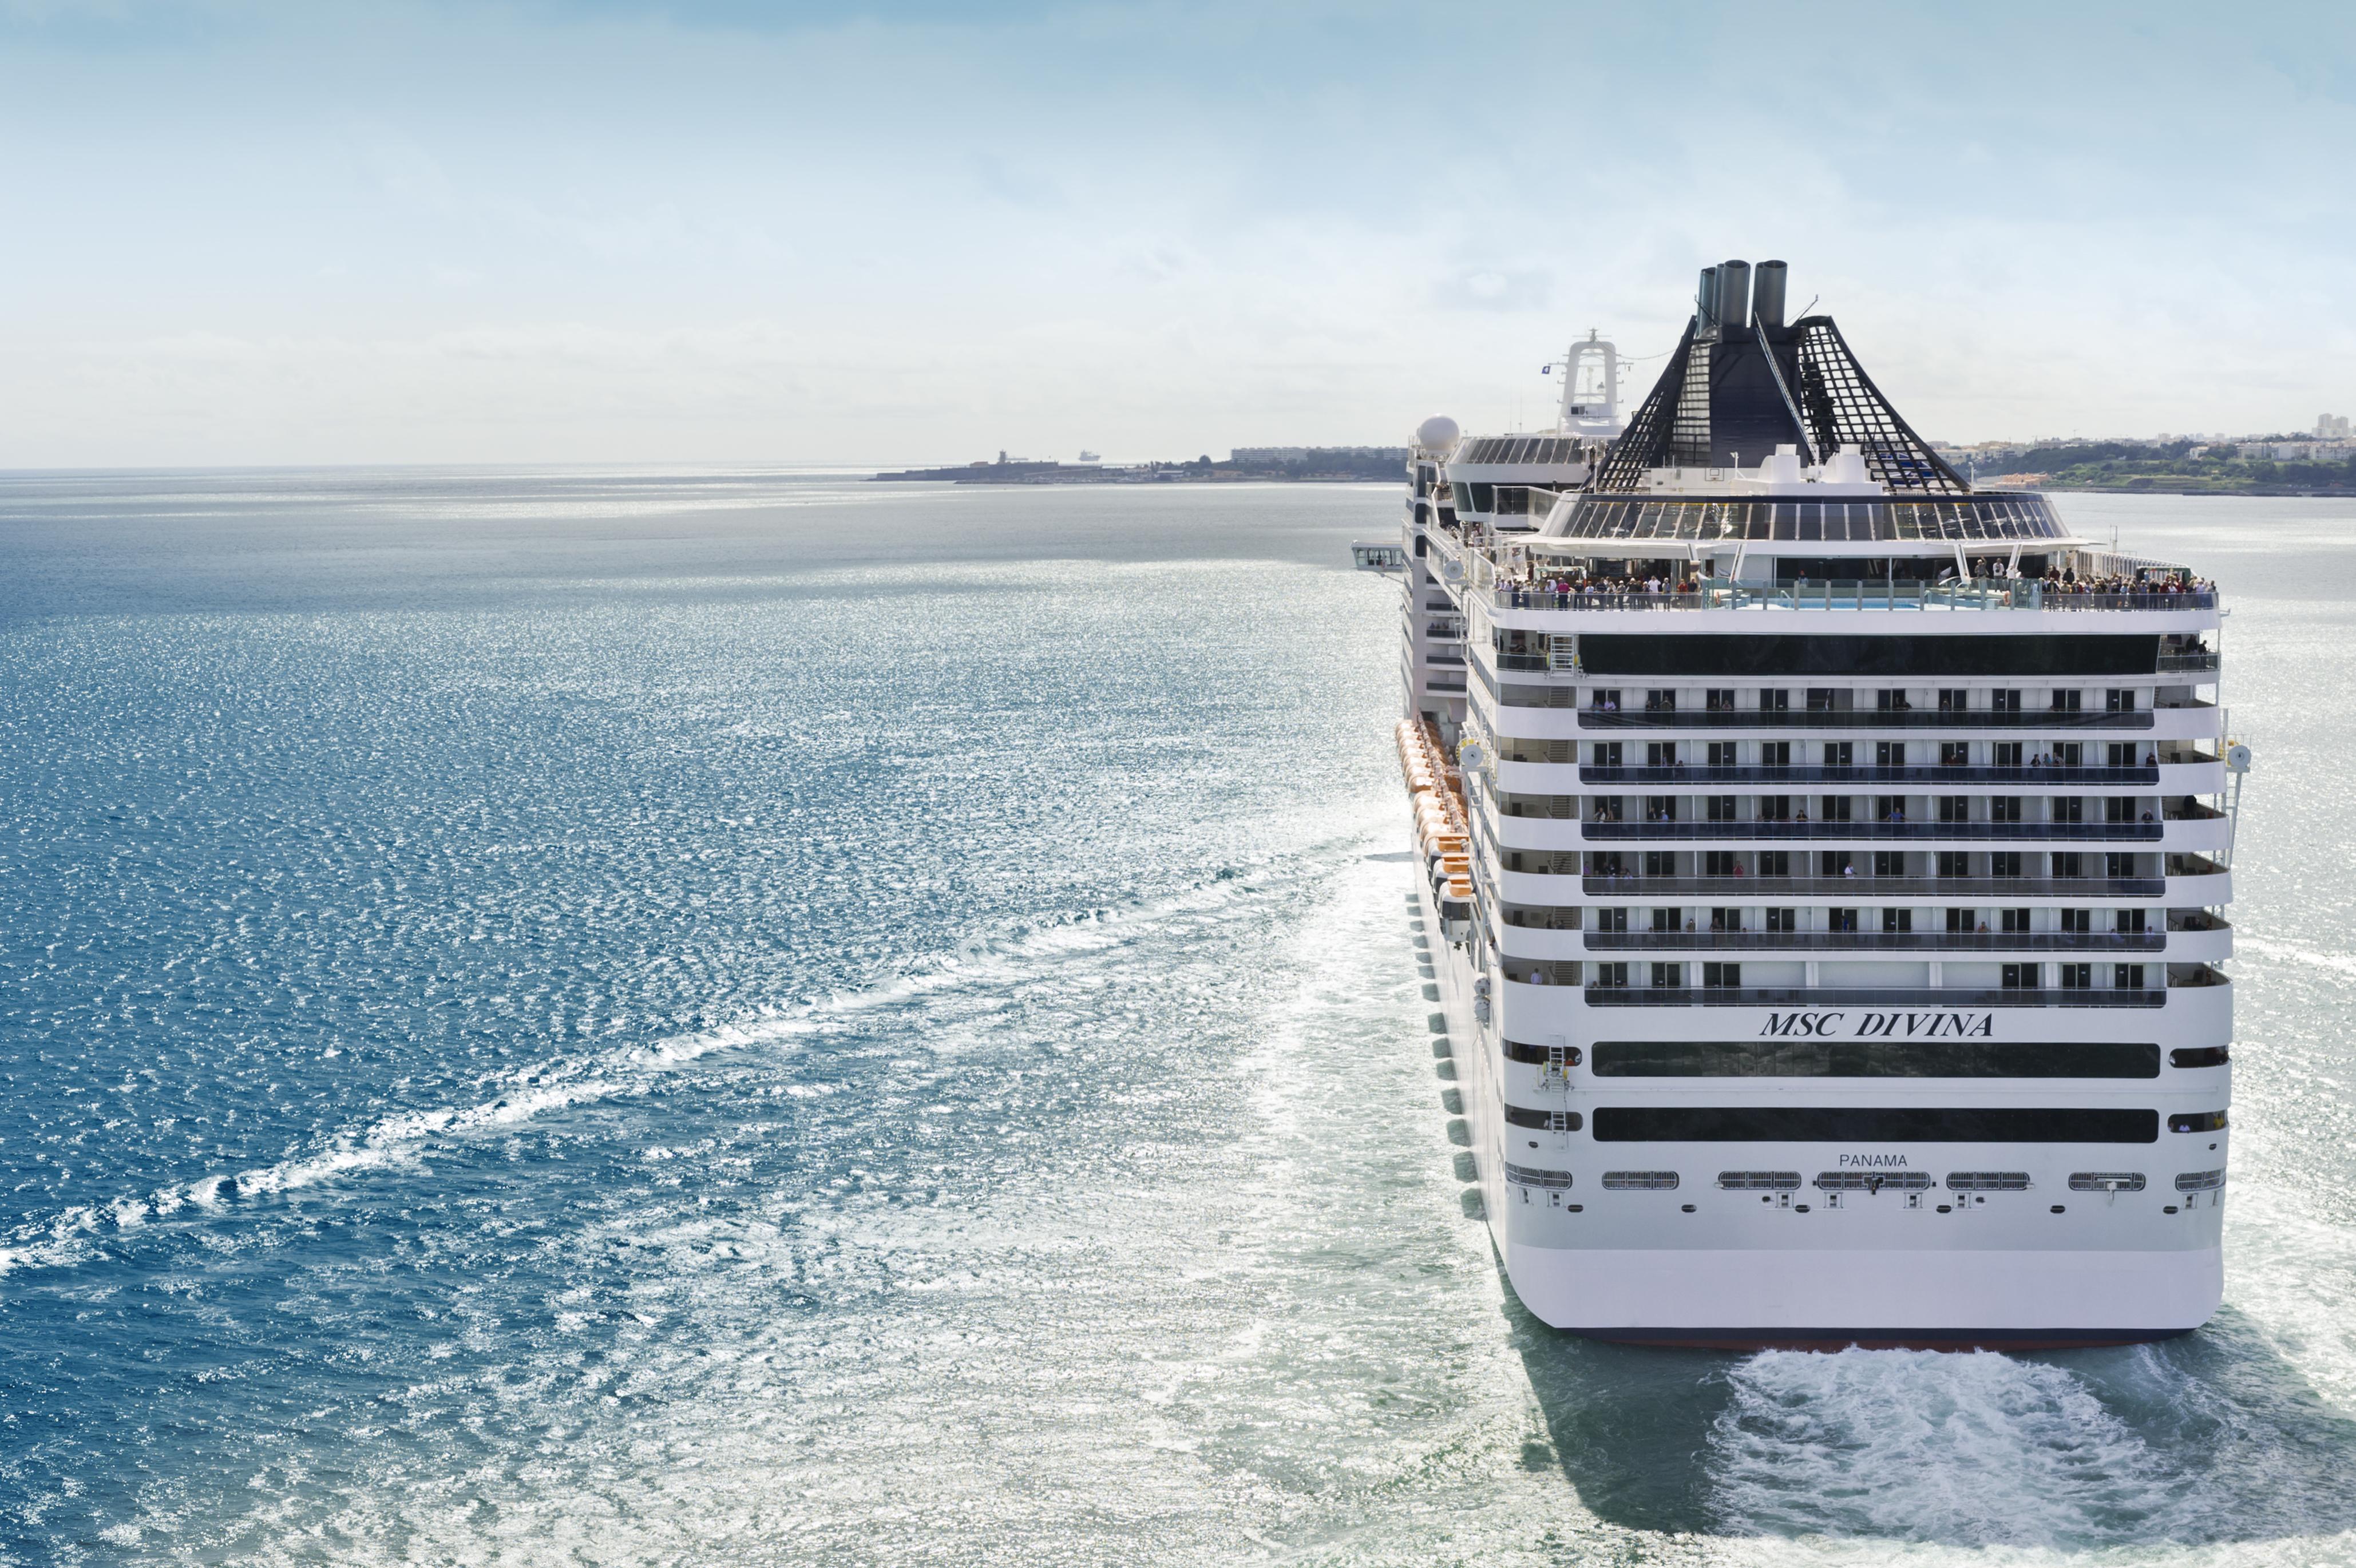 Msc Cruises Miami Cruise Guide